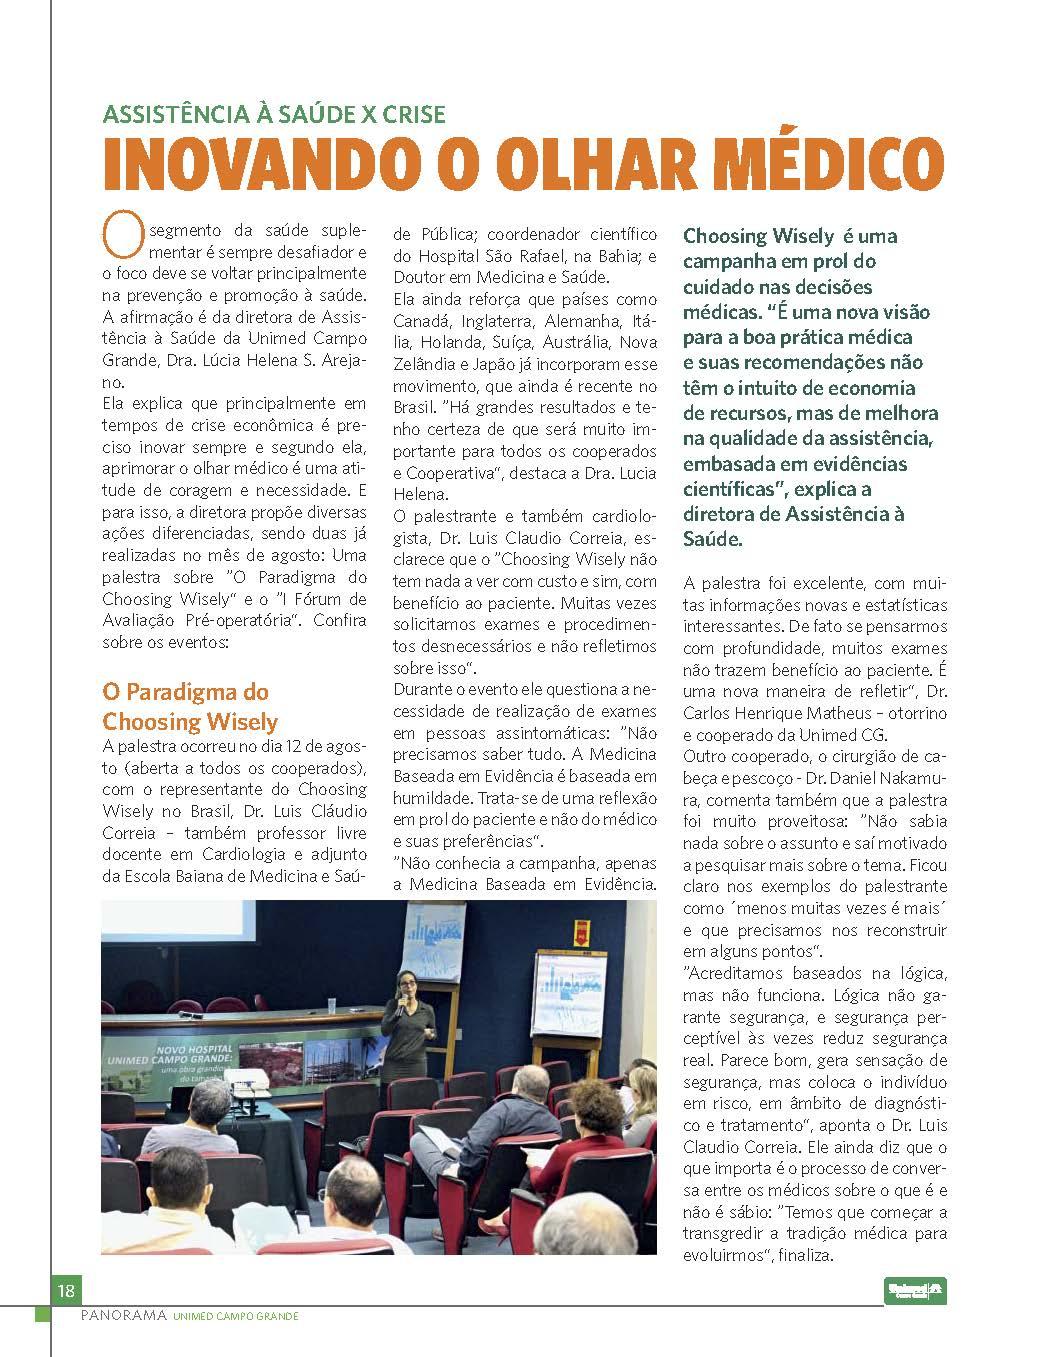 Revista Panorama_2016_Página_18